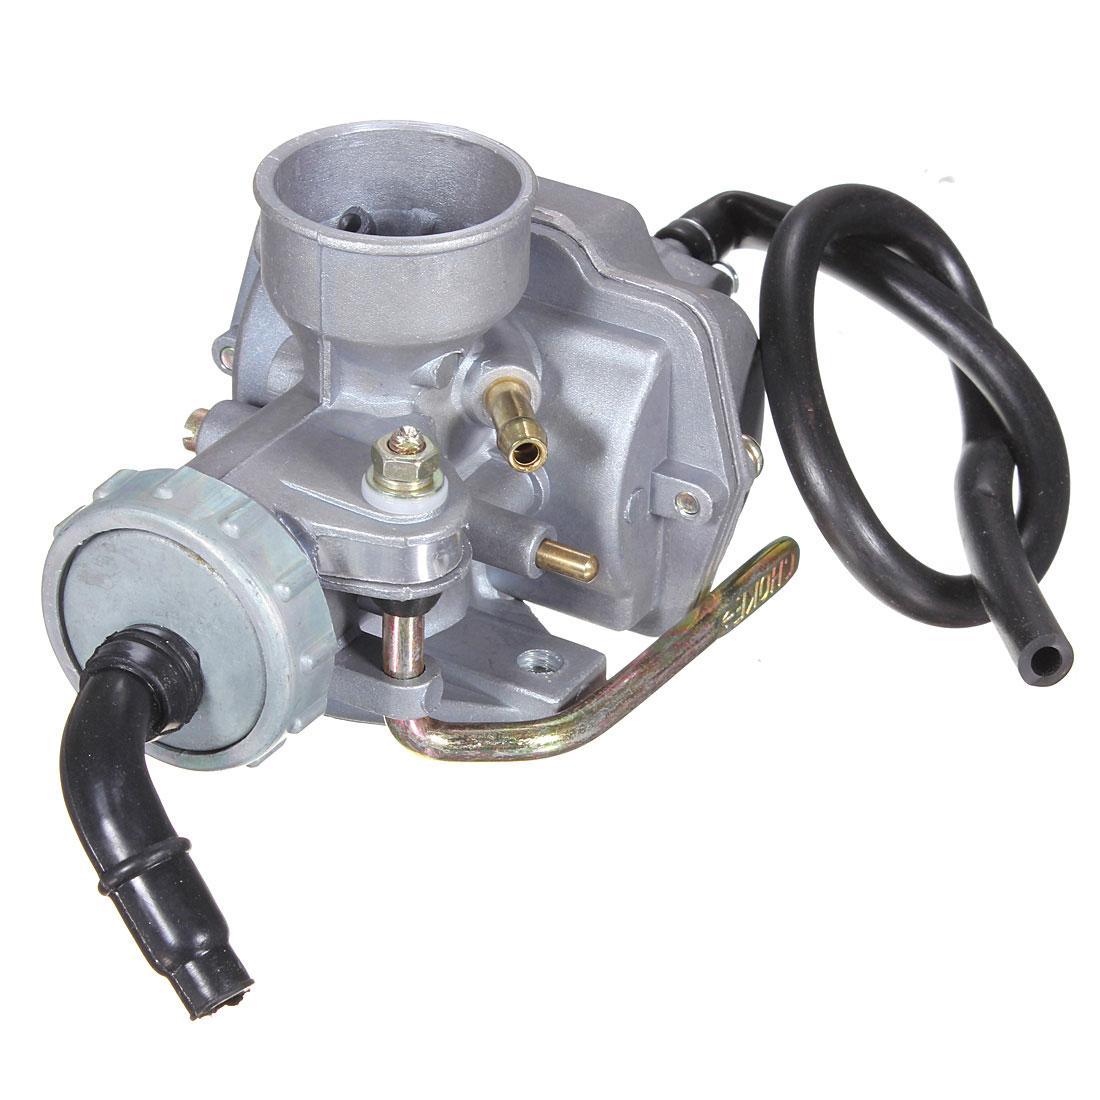 Chinese Atv Carburetor Adjustment